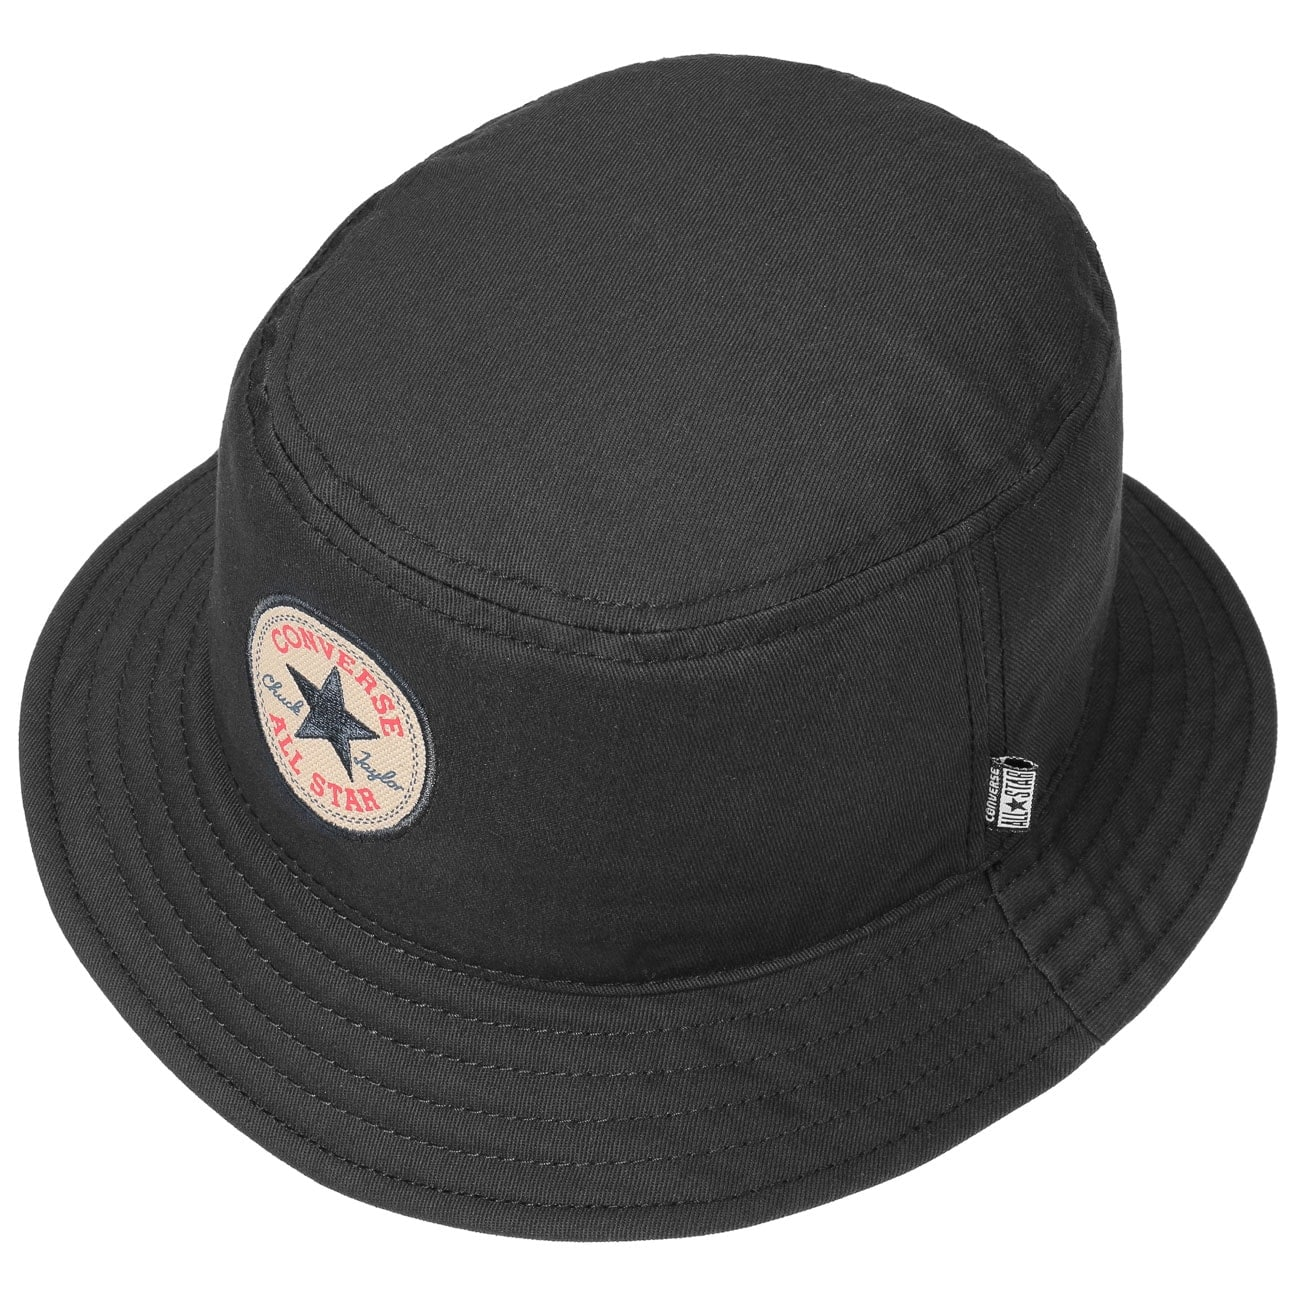 888bcdd3404 ... Classic Bucket Hat by Converse - black 2 ...